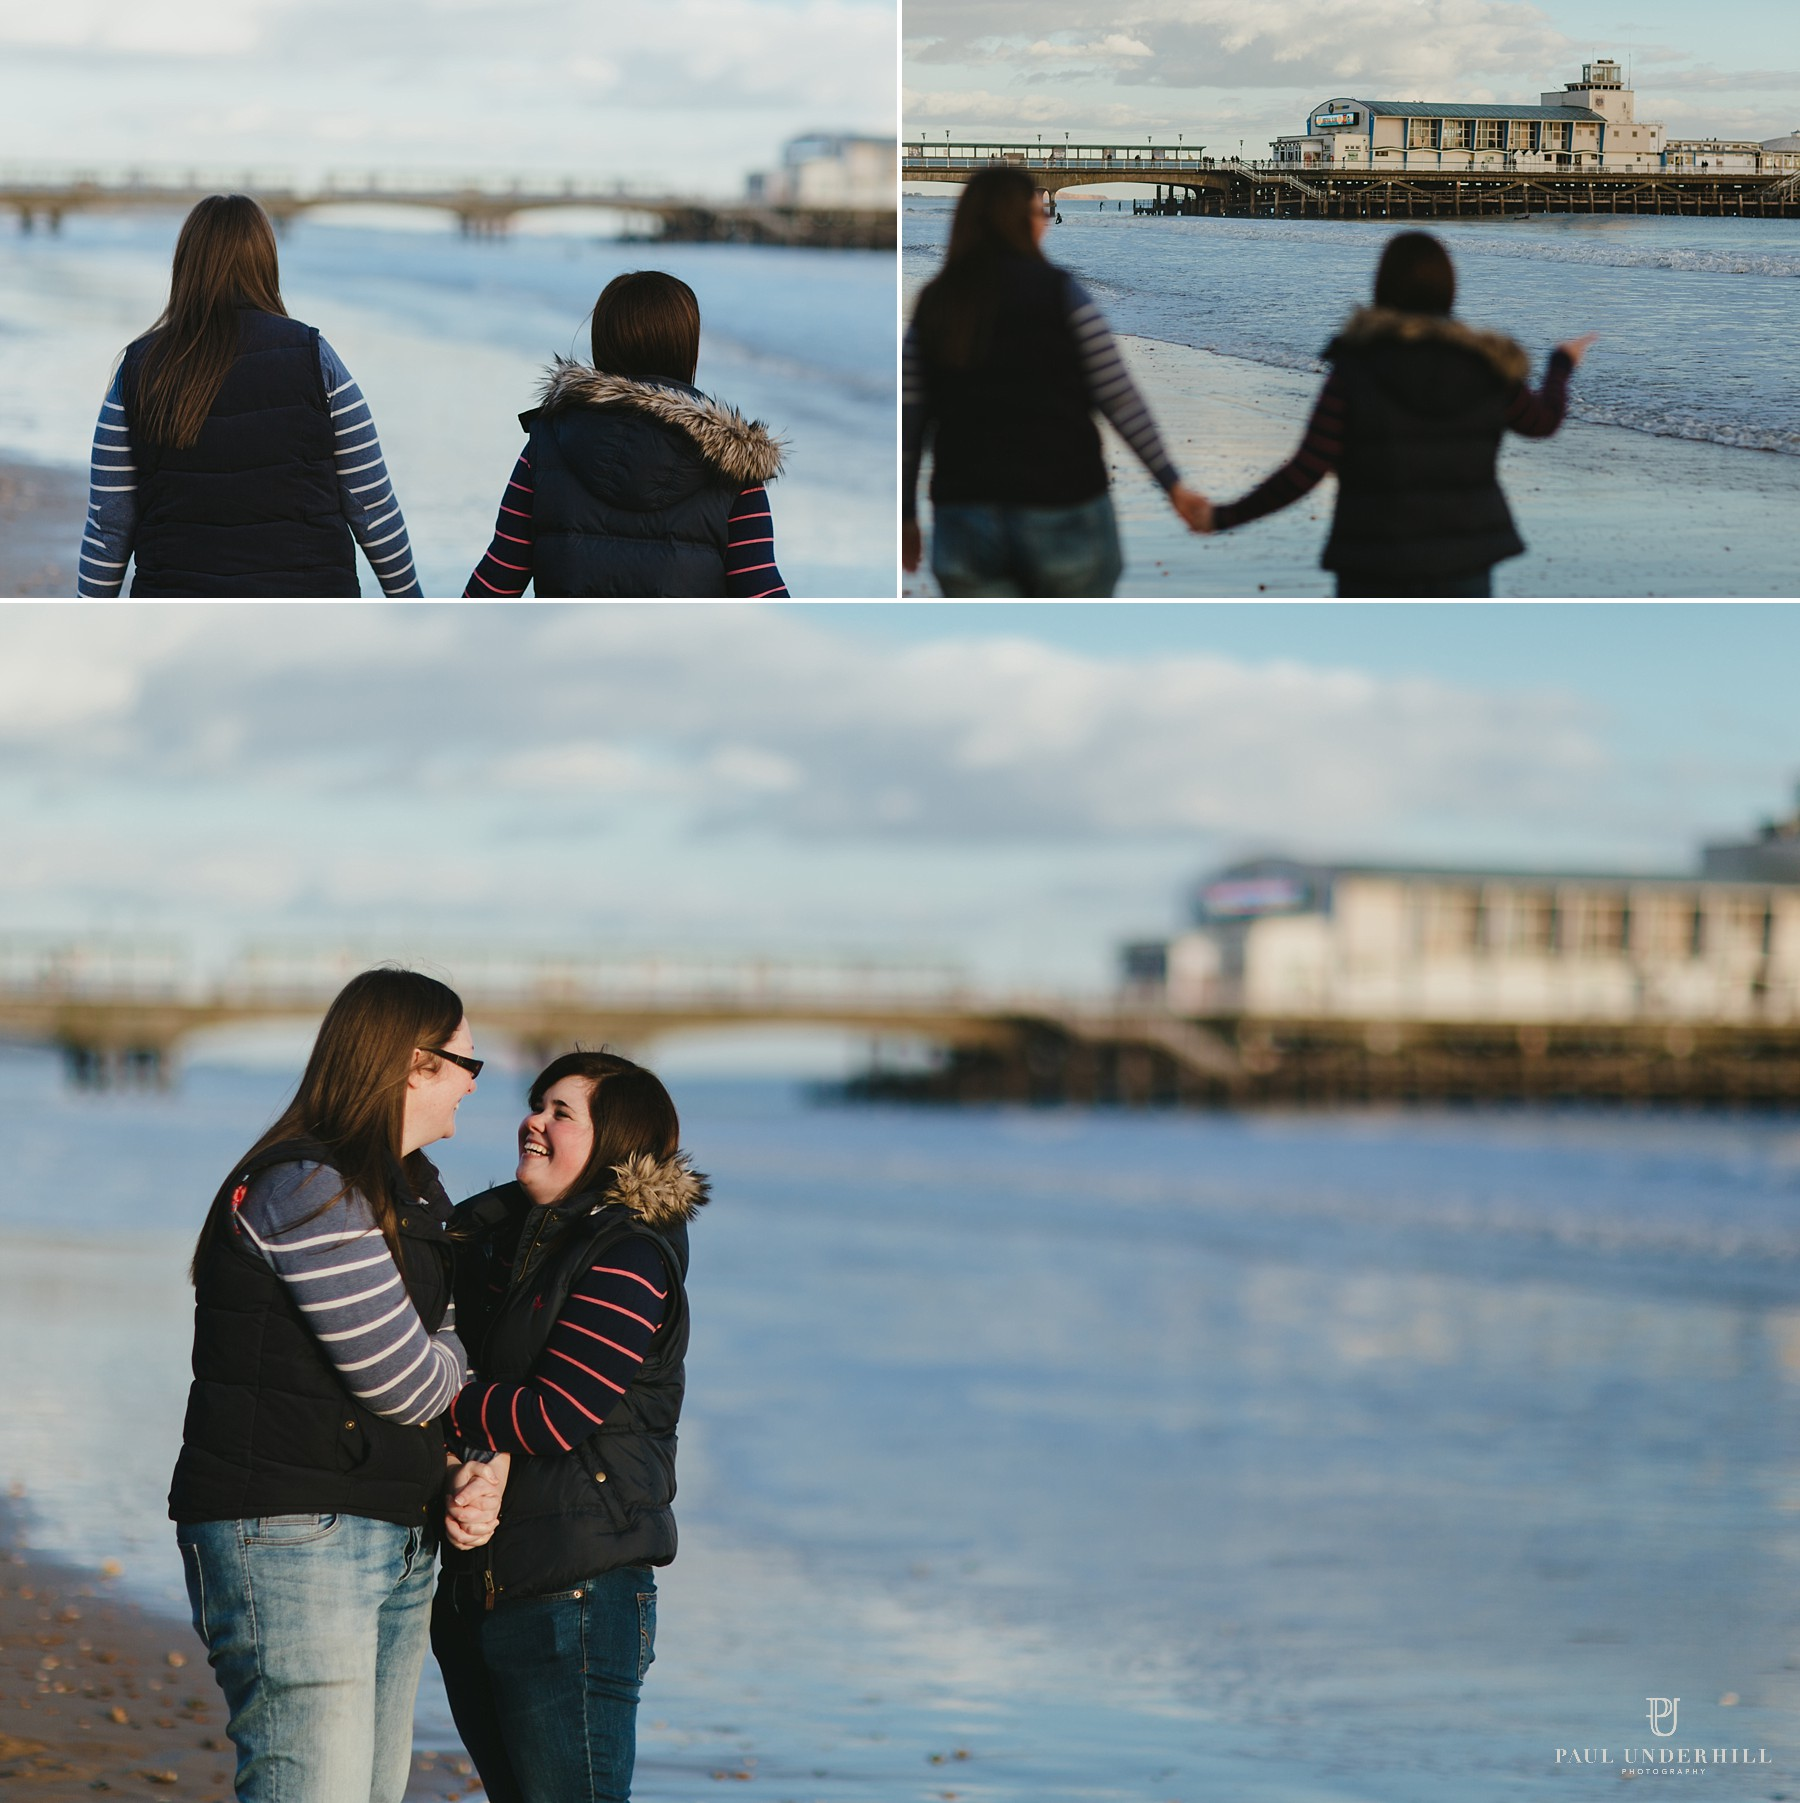 Dorset photographers creative portraits